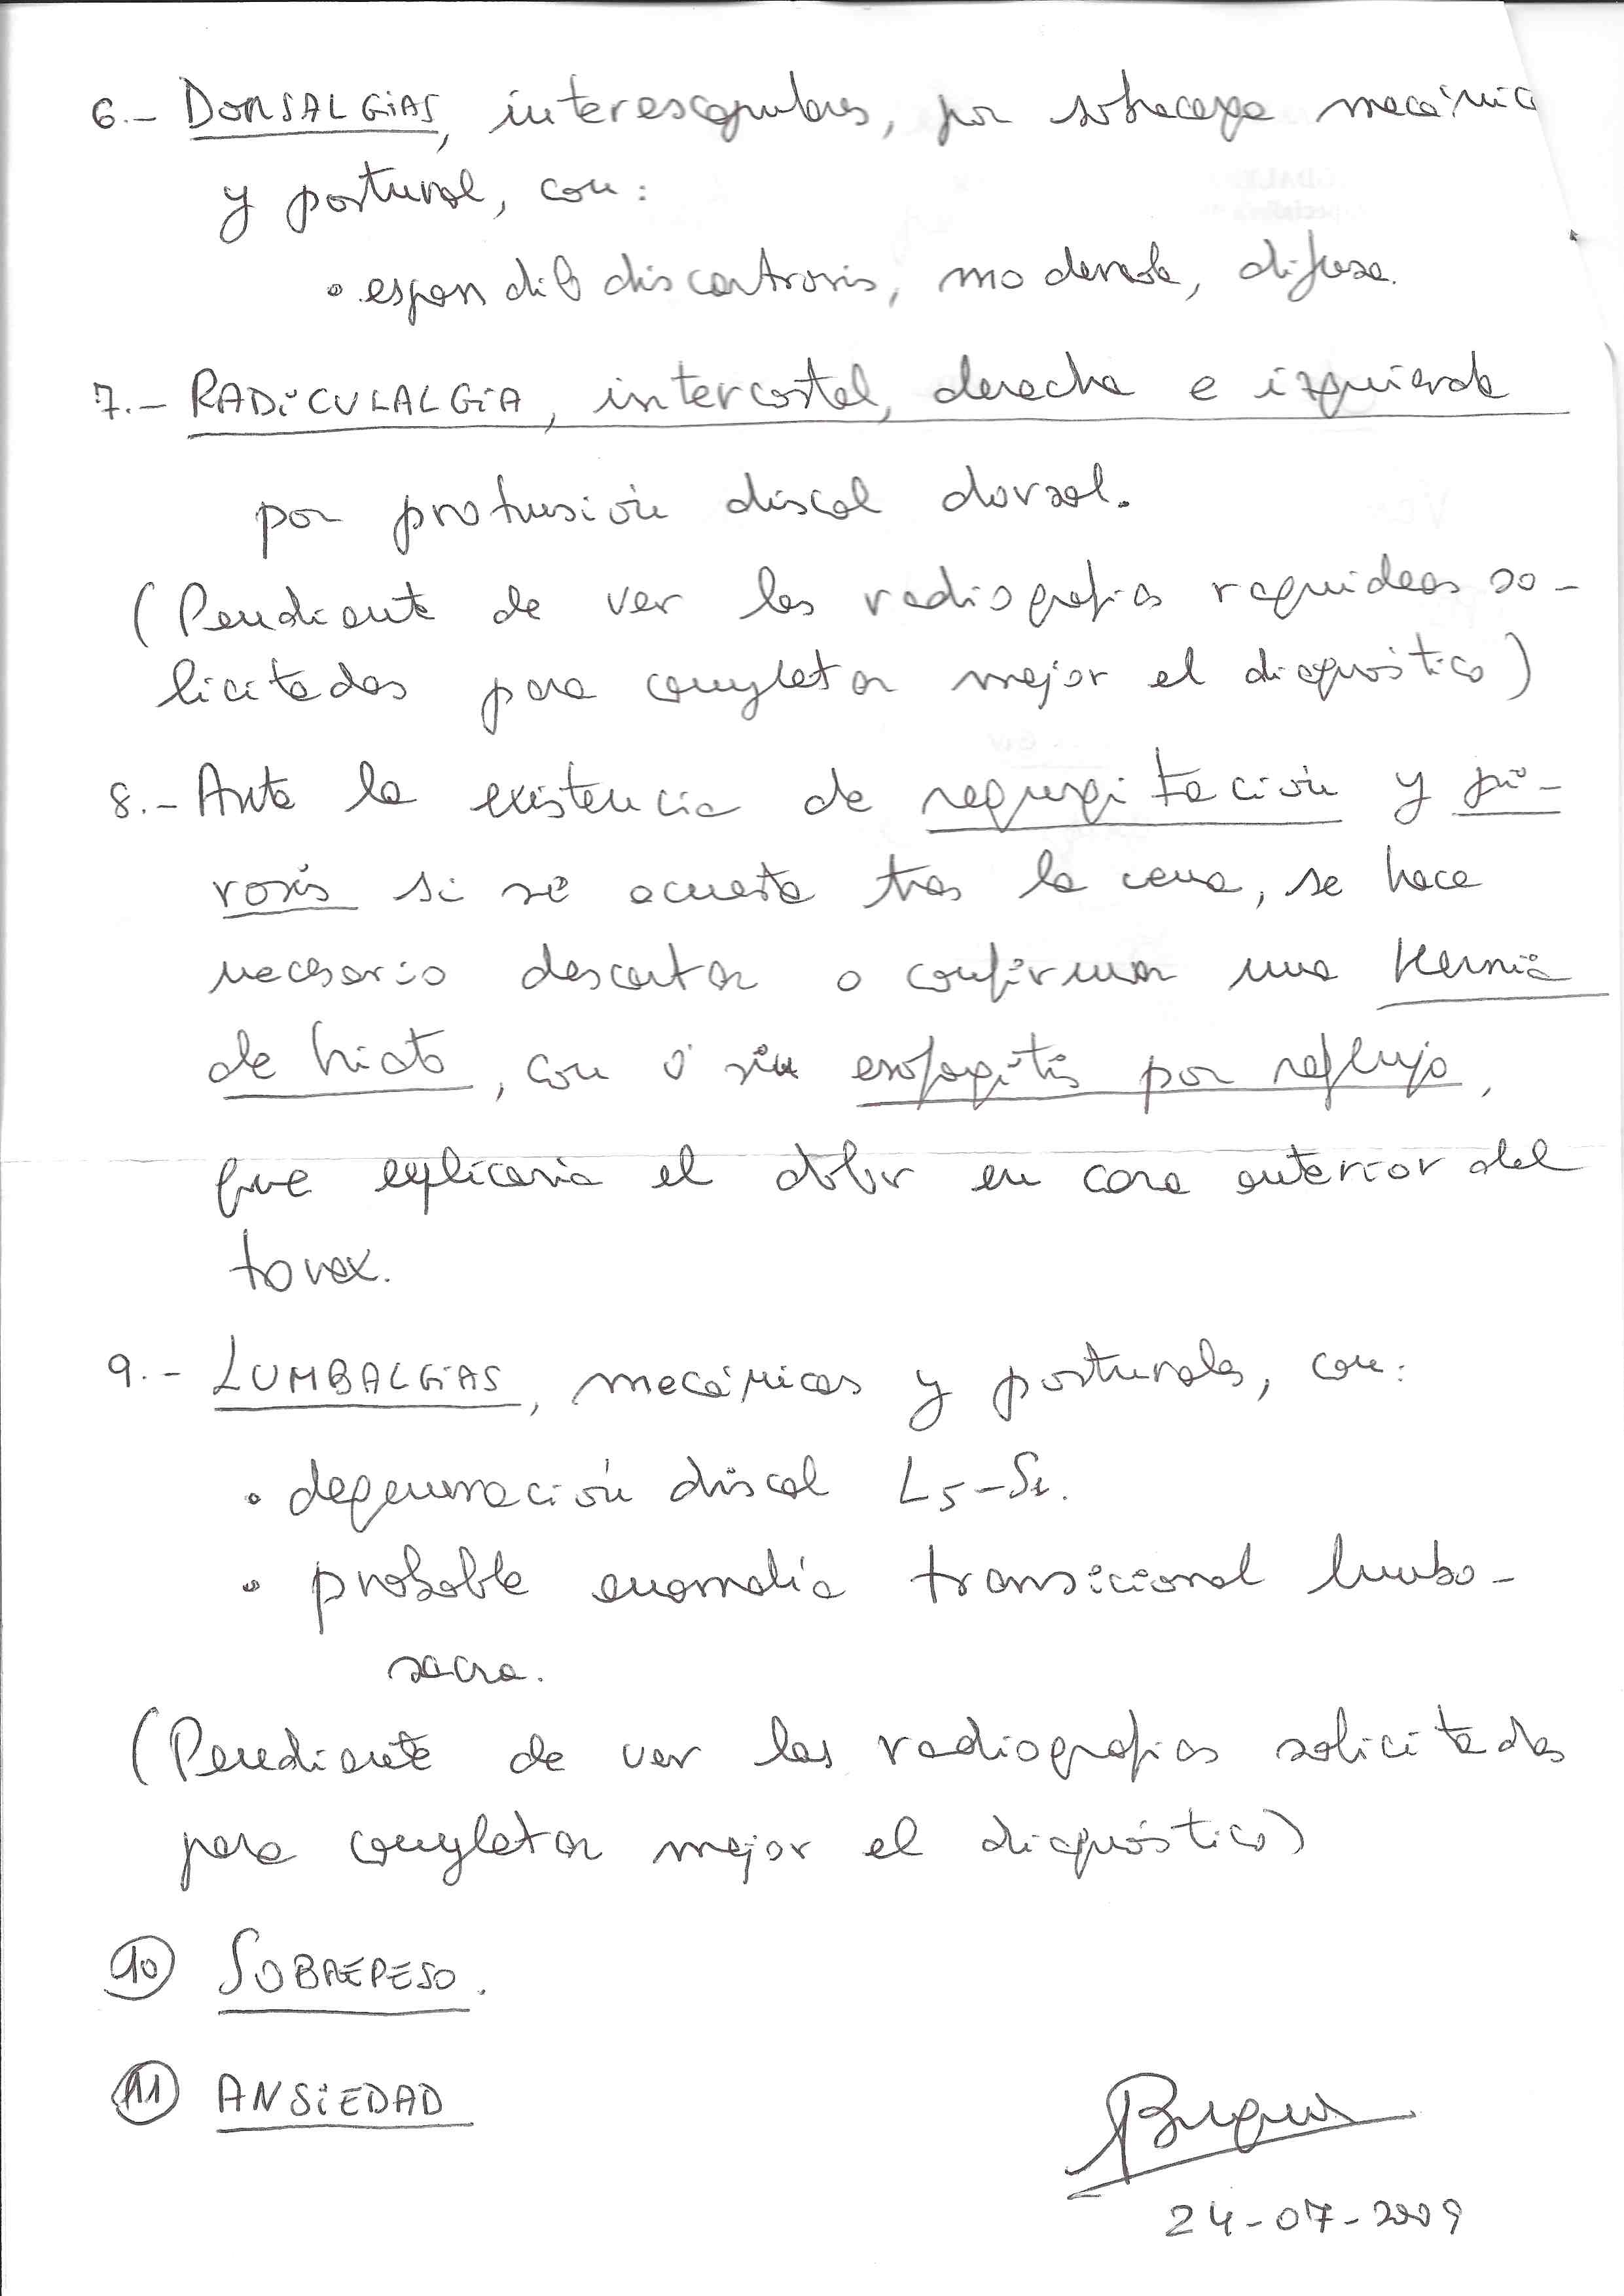 2 - 24 Julio 2009 - Reumatologia_Page_2